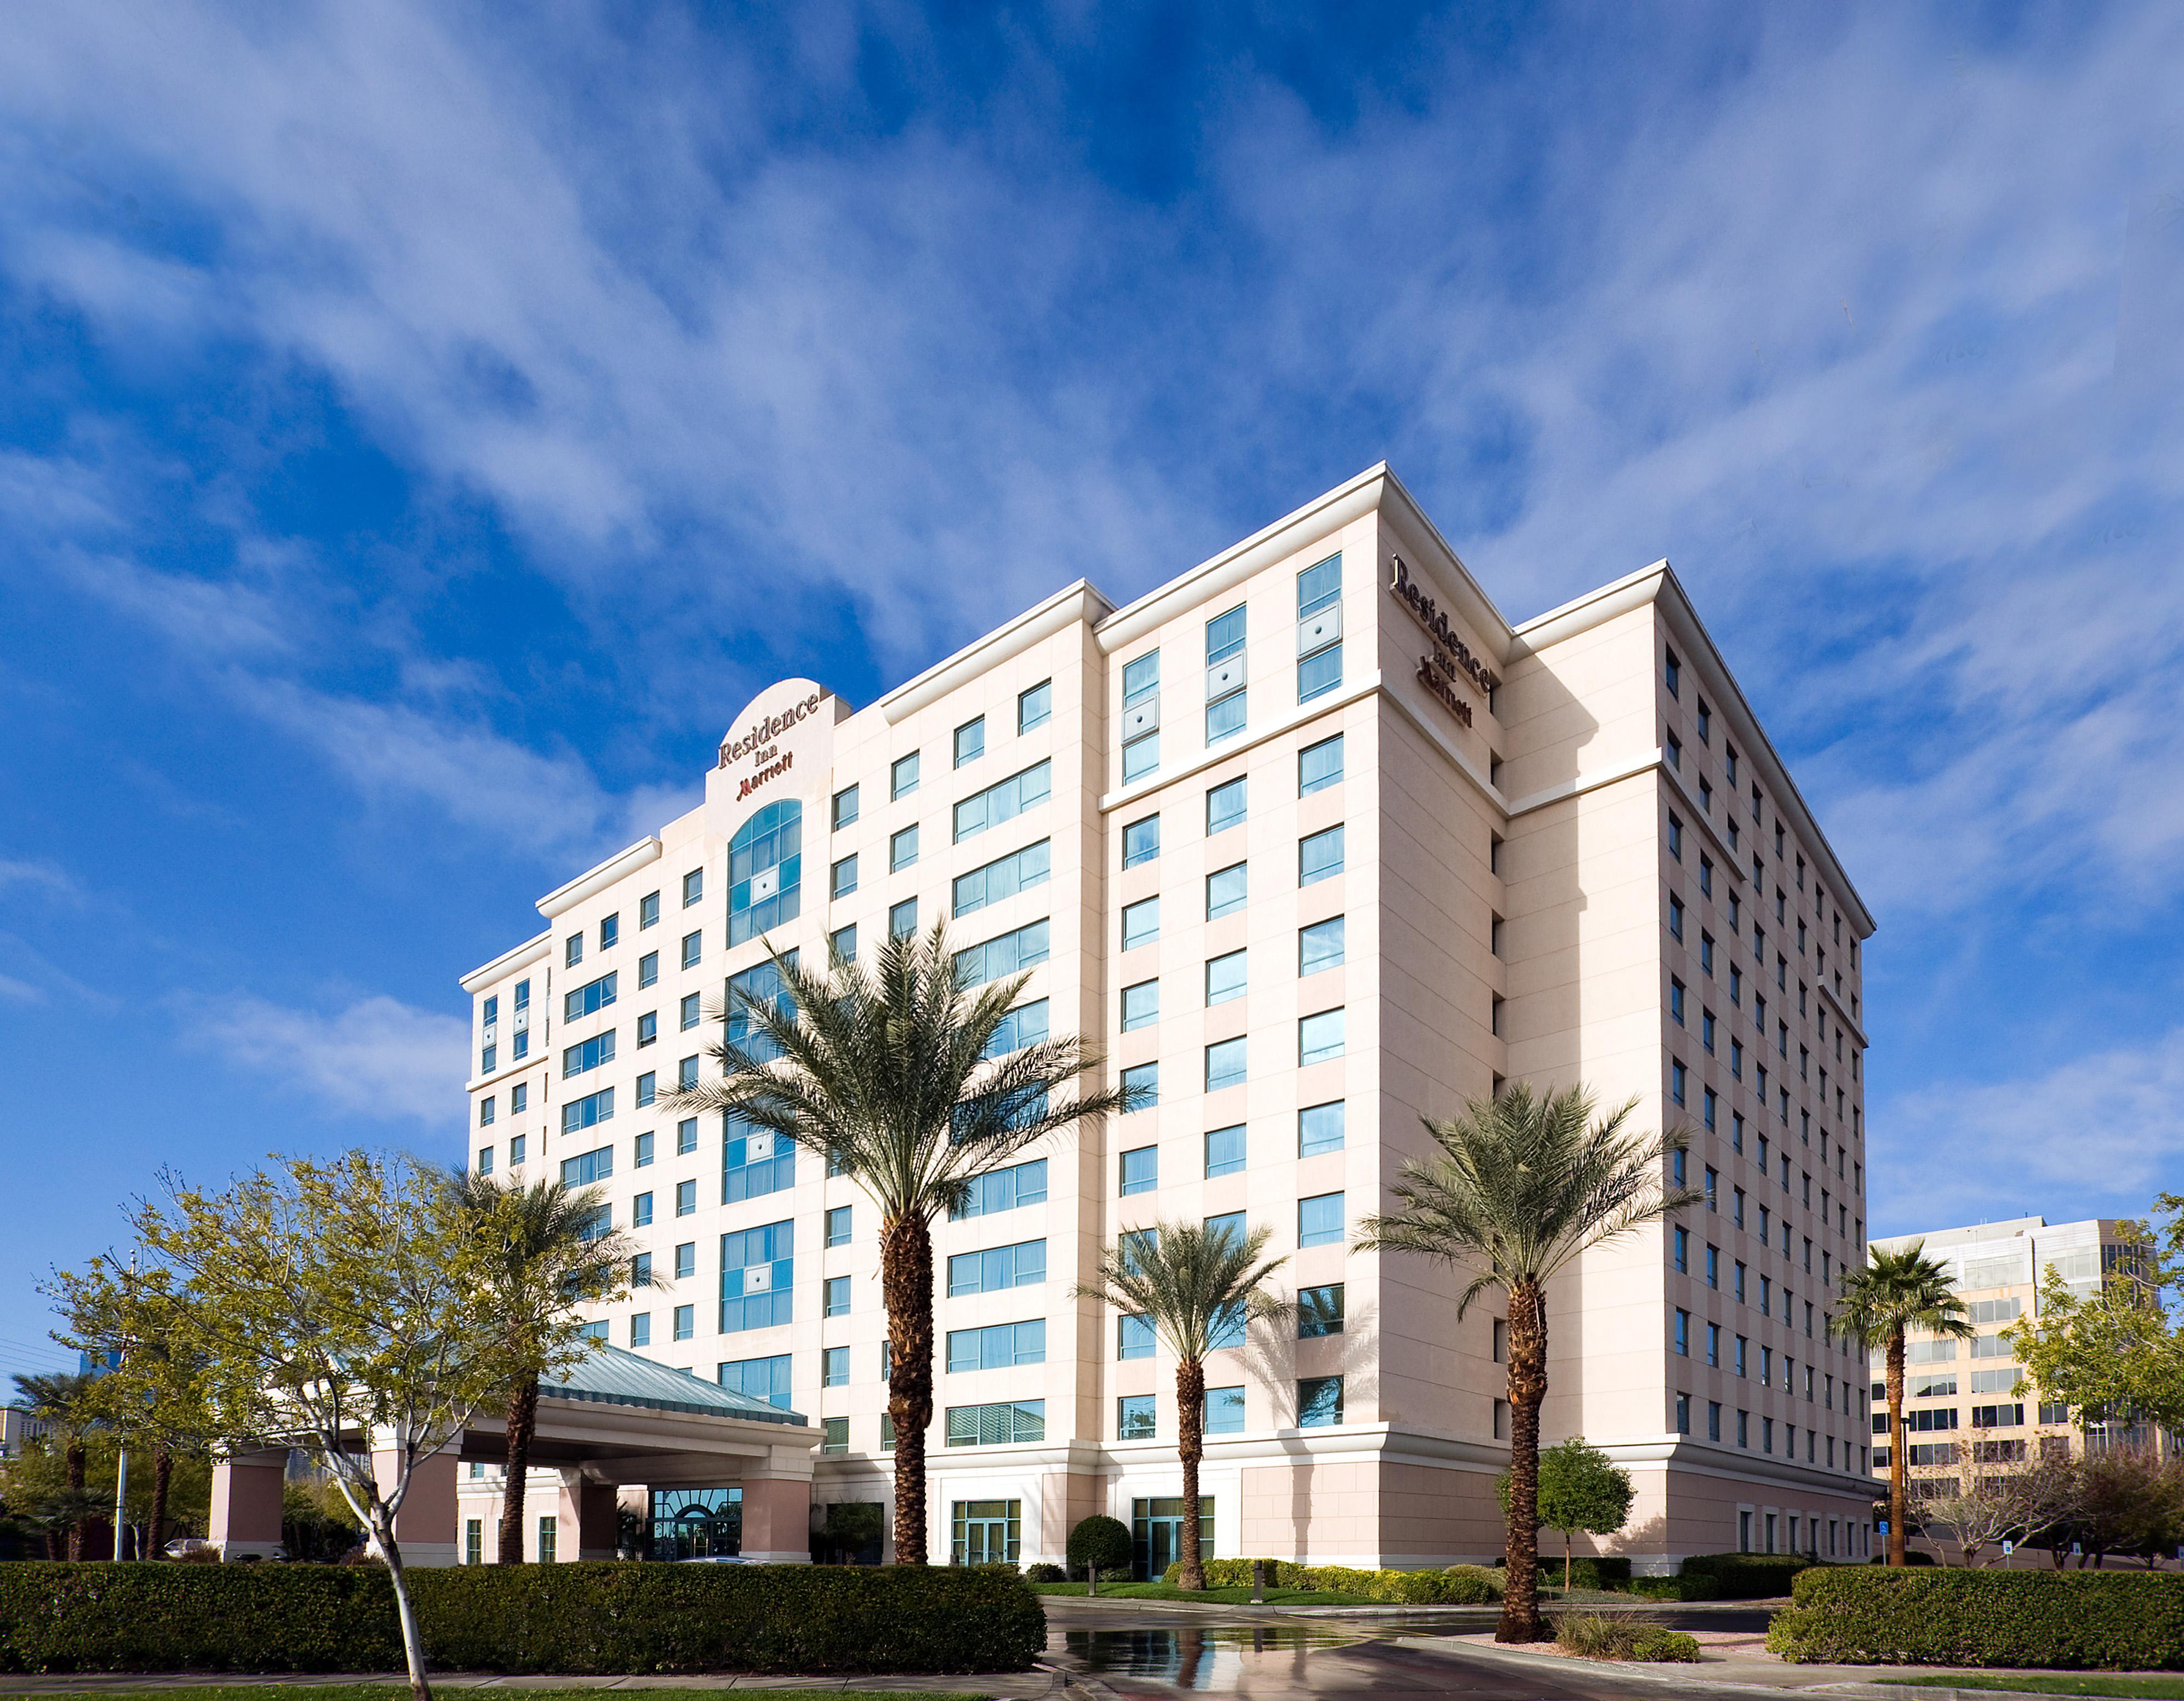 Residence inn by marriott las vegas hughes center las - Regis college swimming pool hours ...